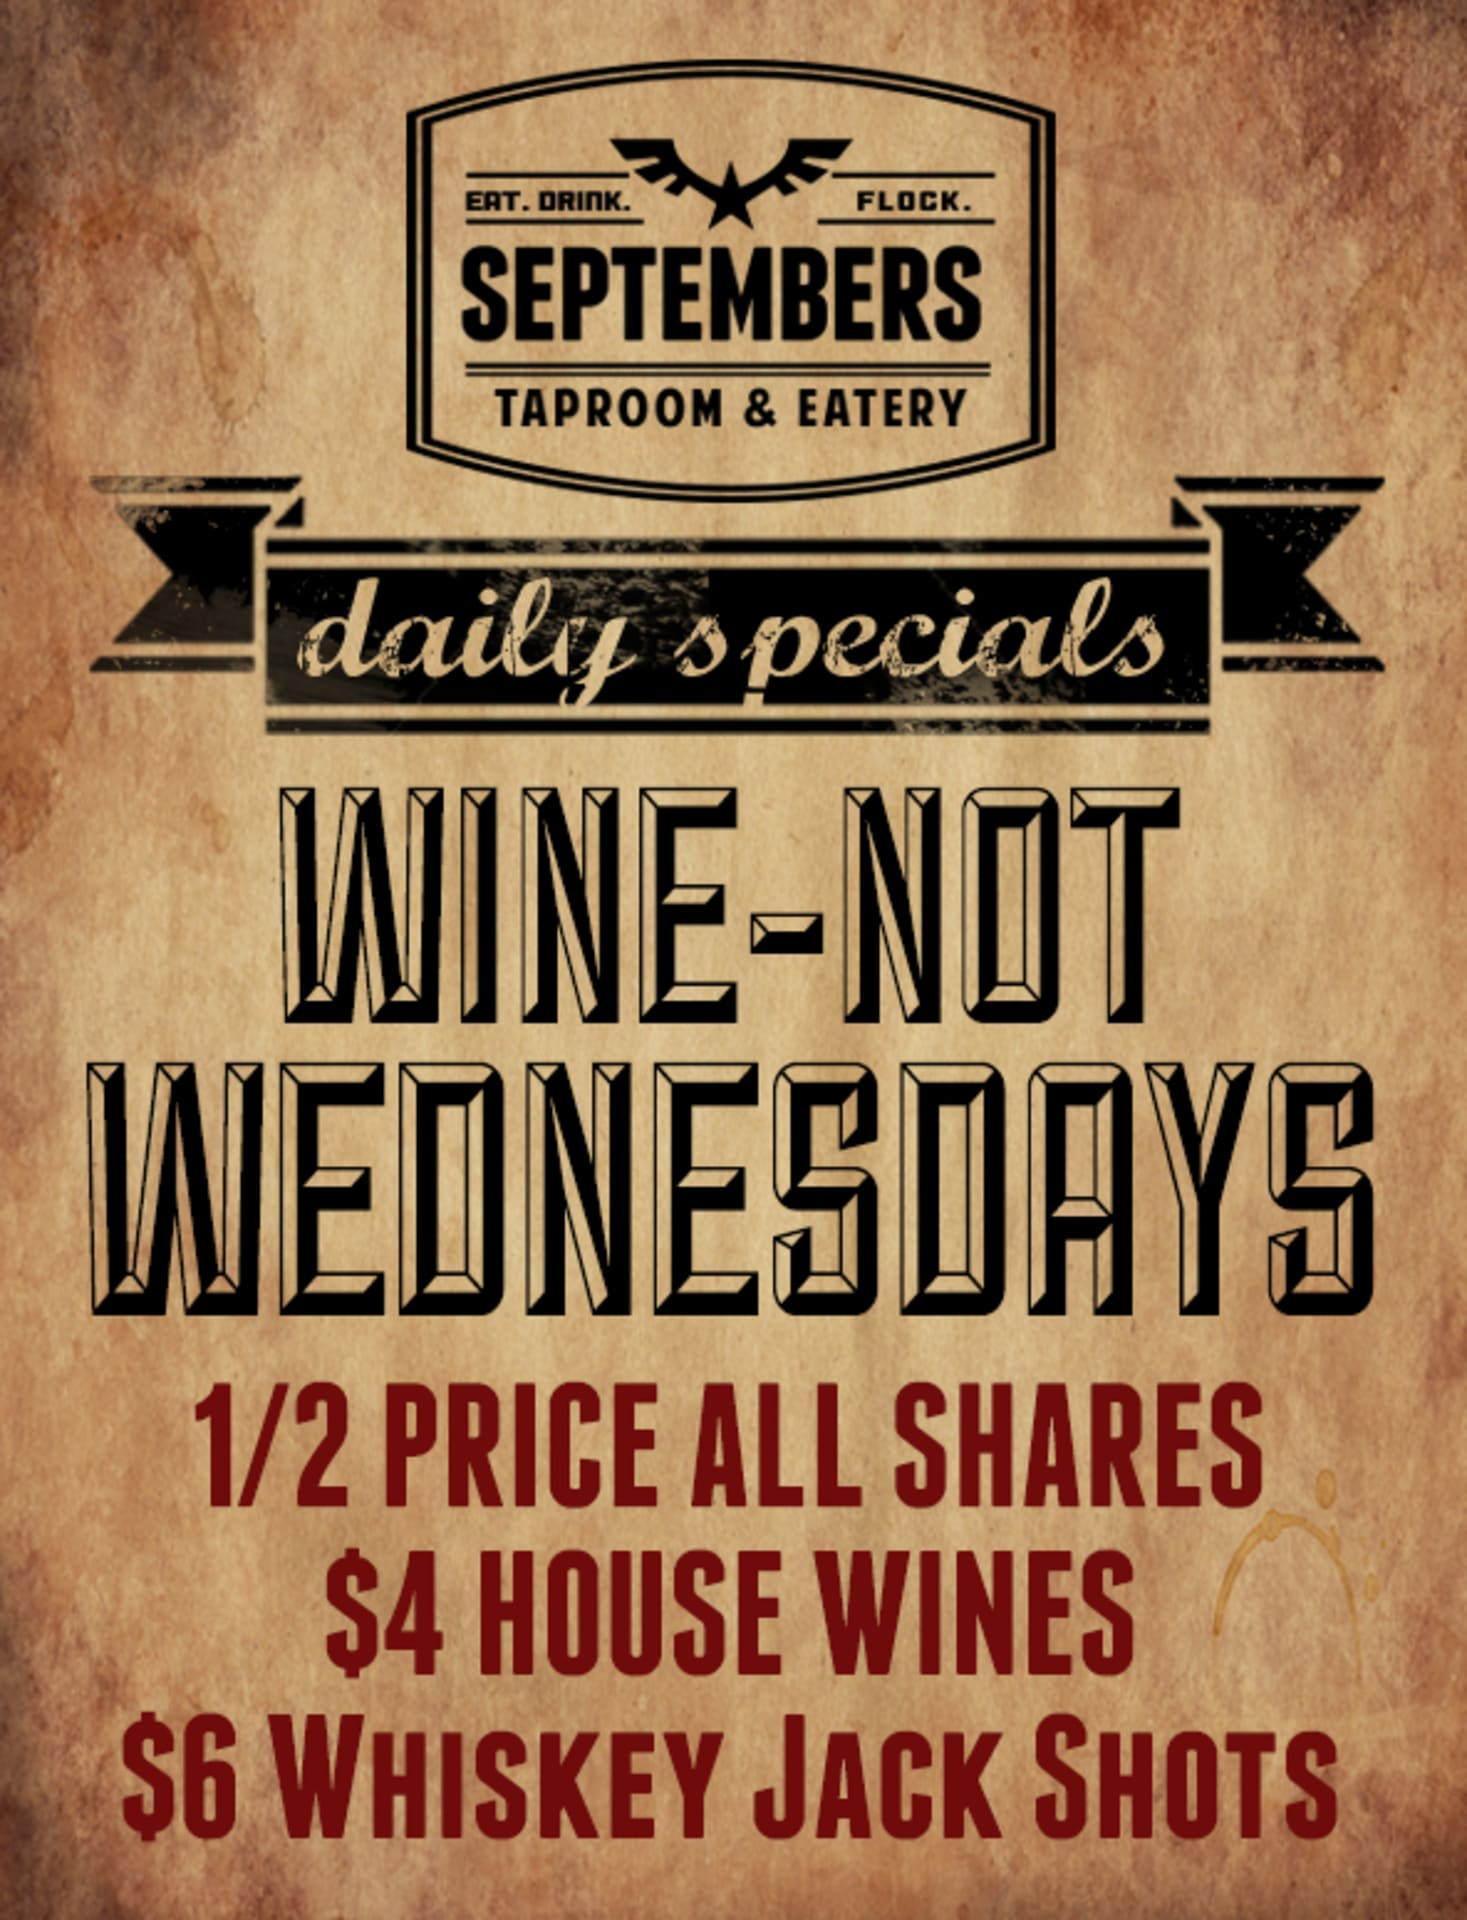 Wednesday   Wine-not Wednesday